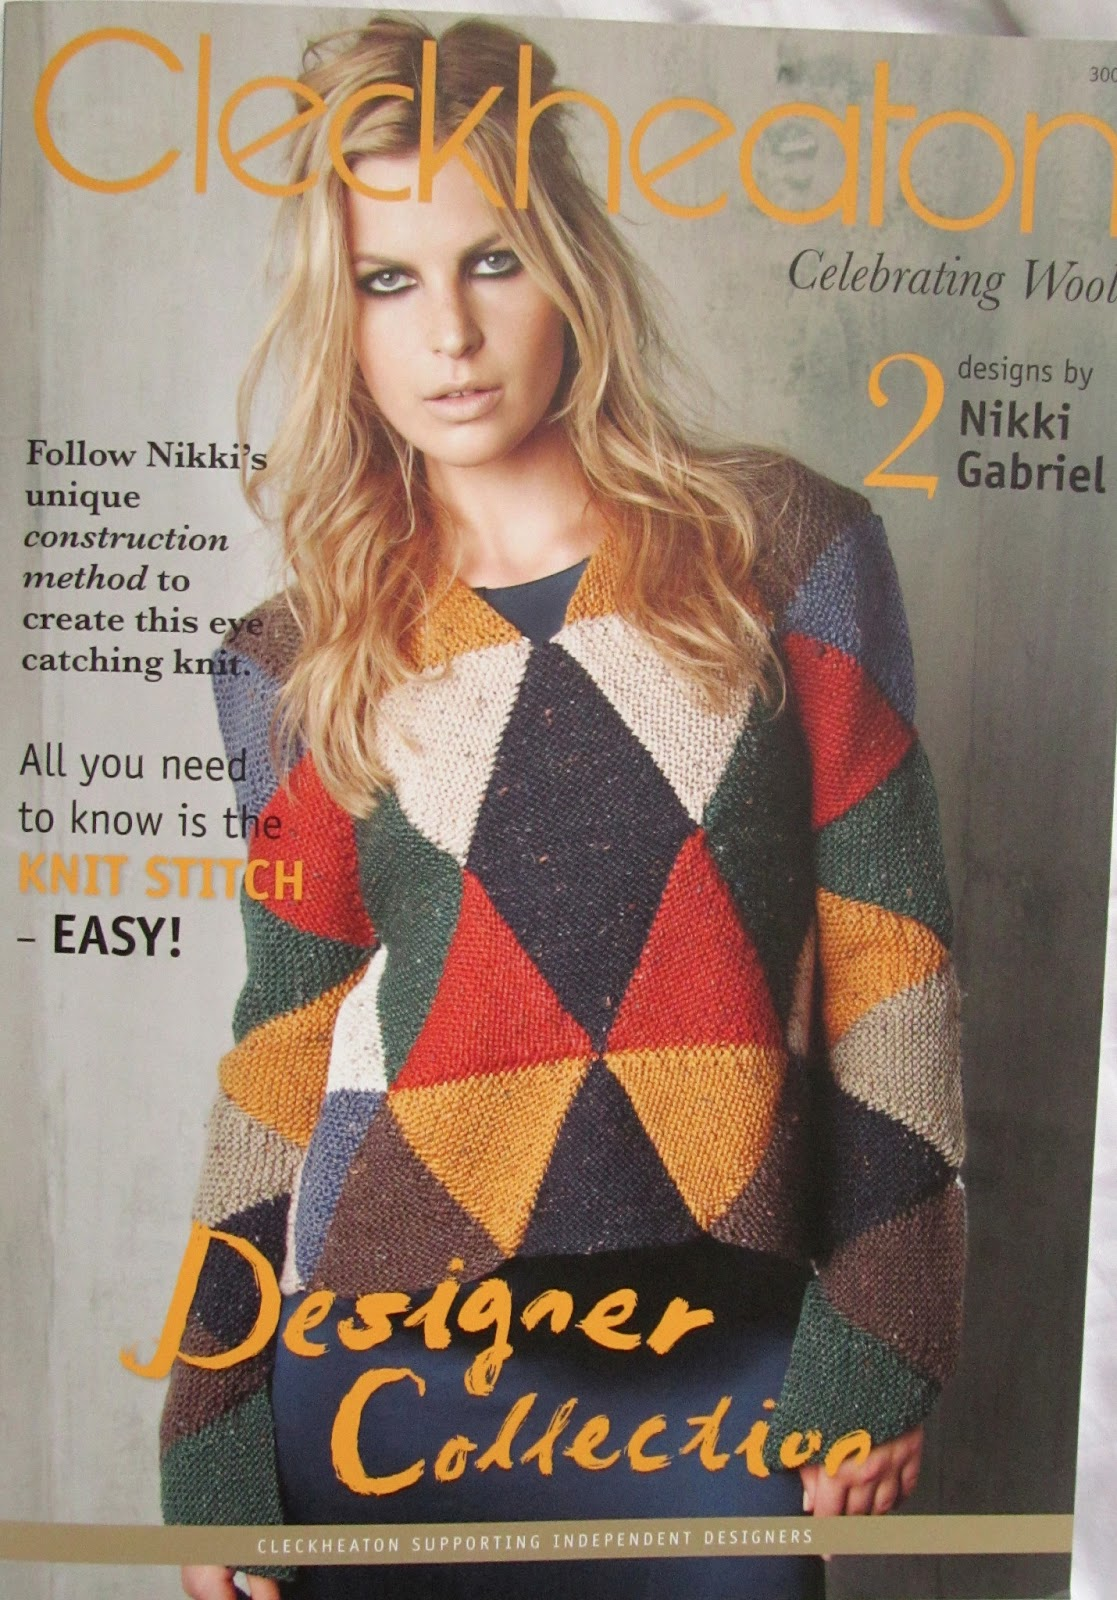 nikki gabriel: Triangle Knitting Construction Pattern